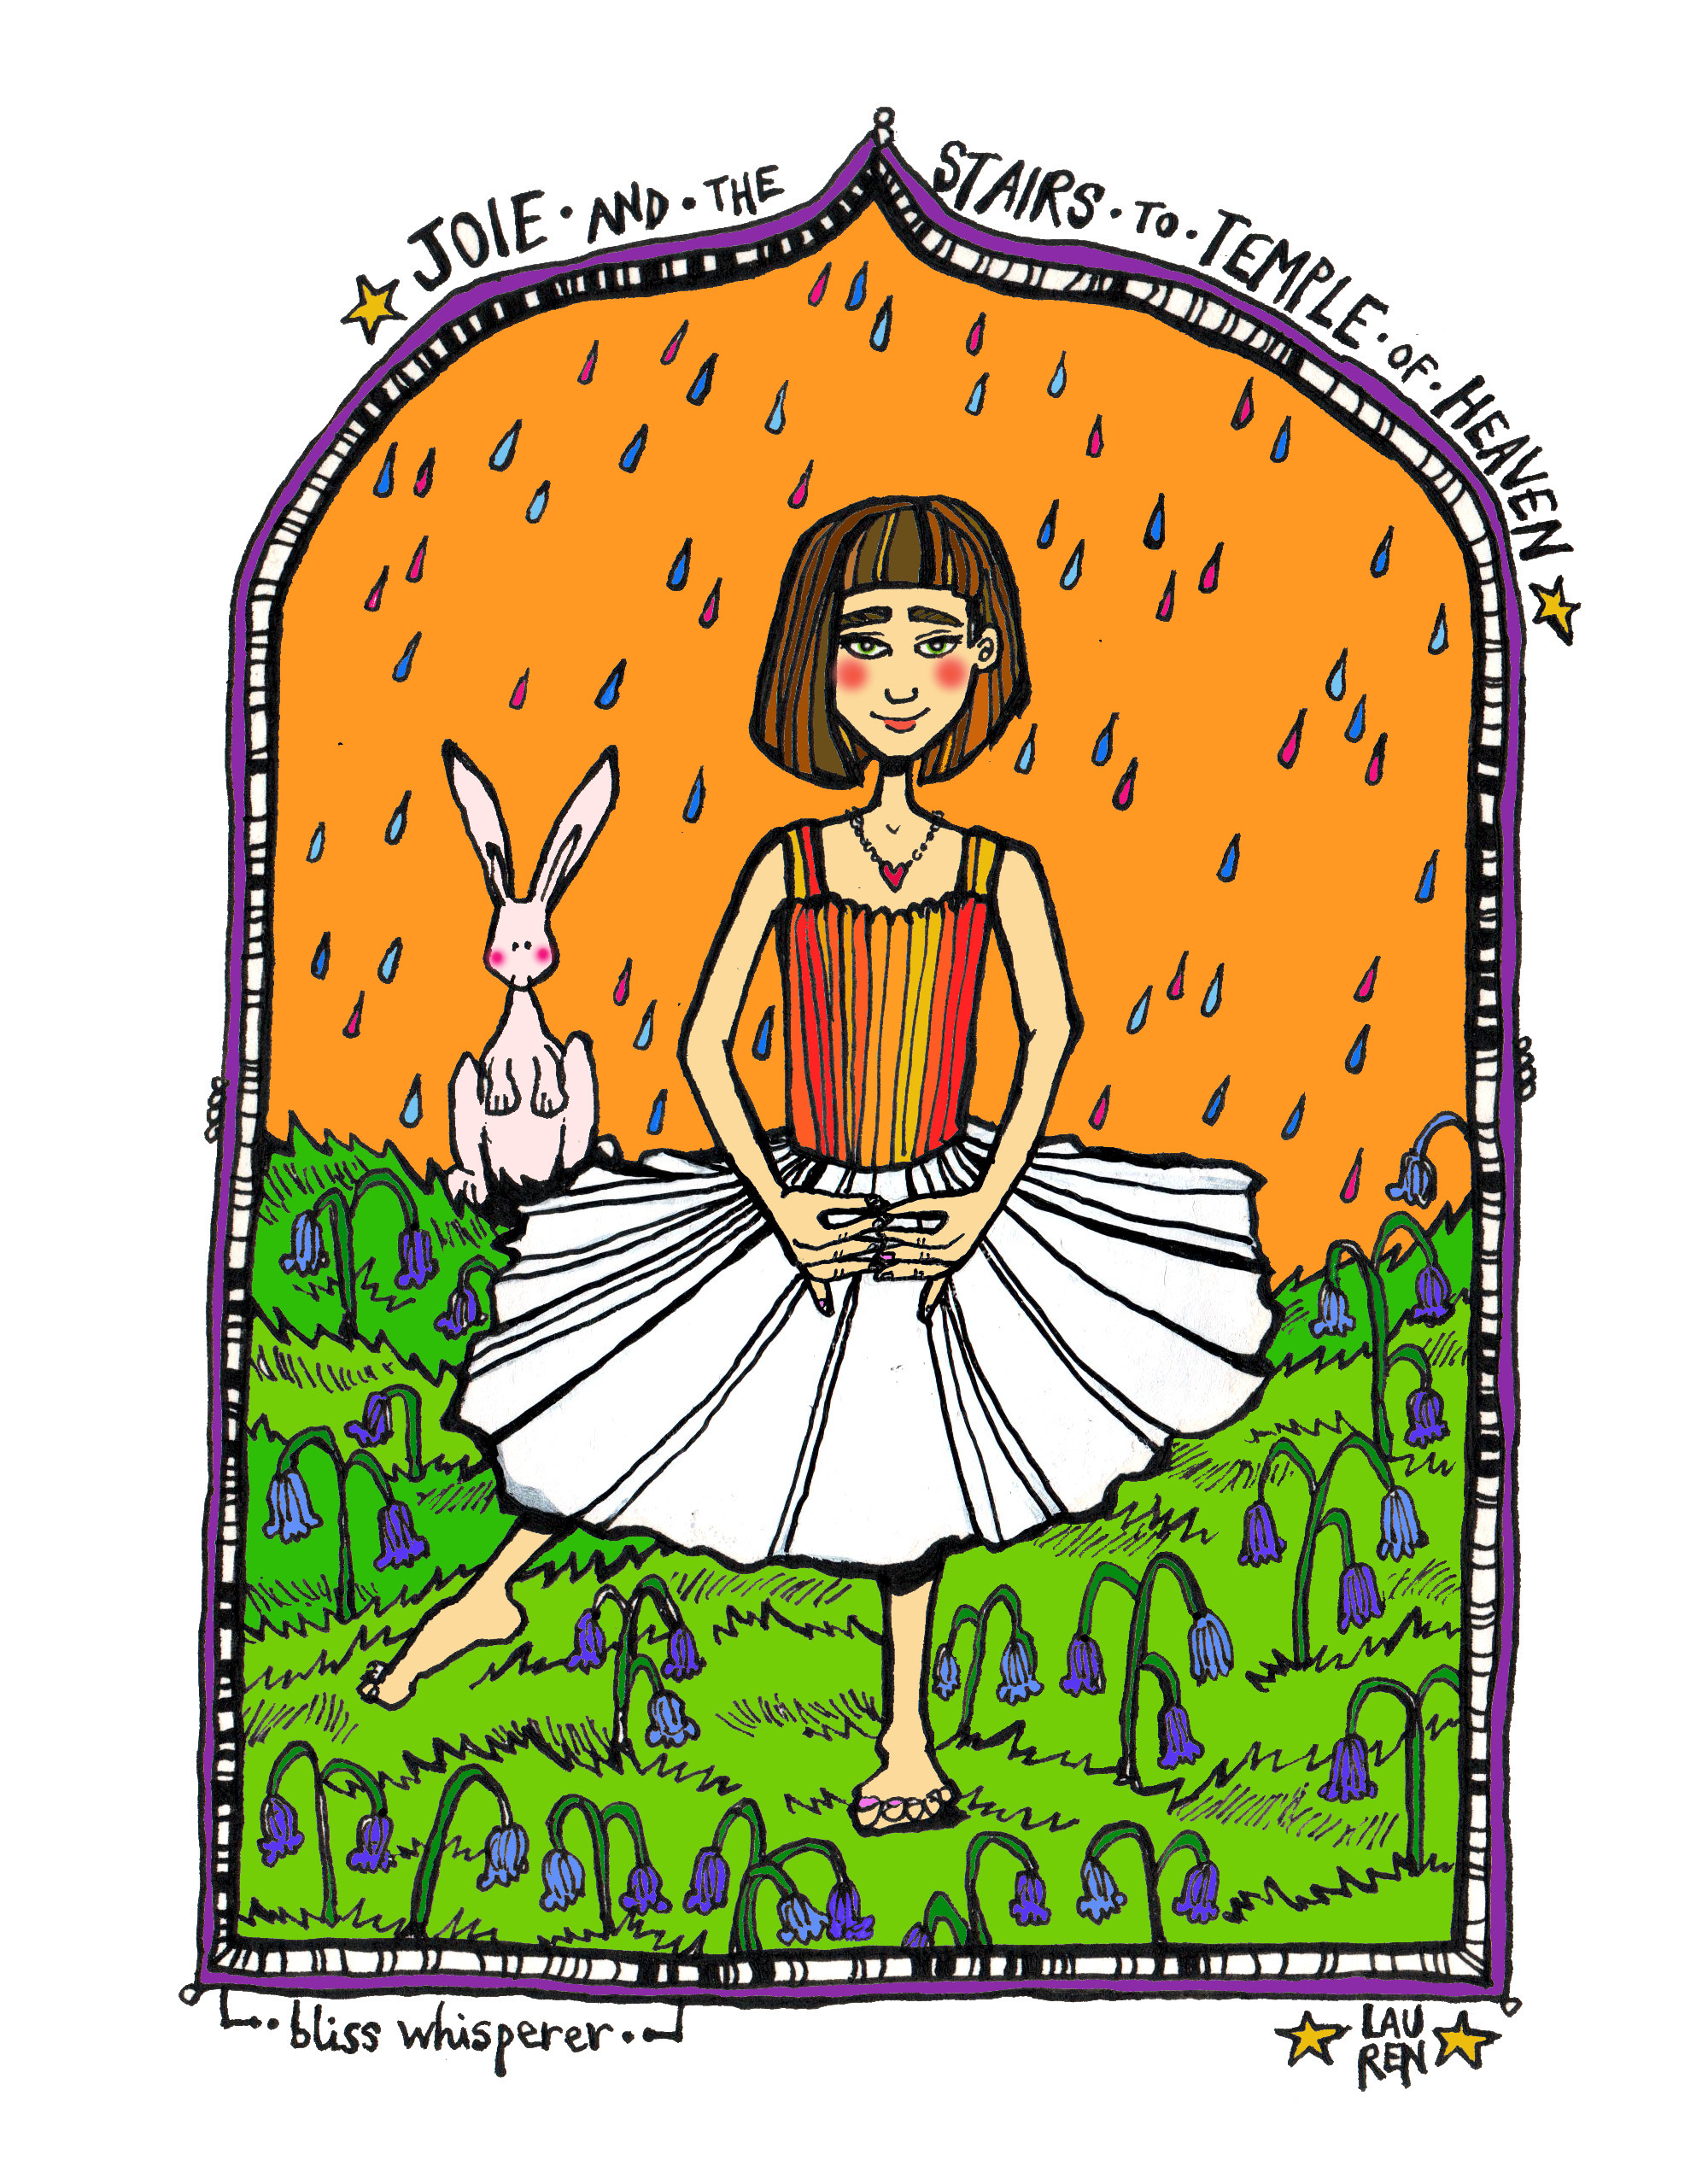 Joie the Bliss Whisperer (colourway)